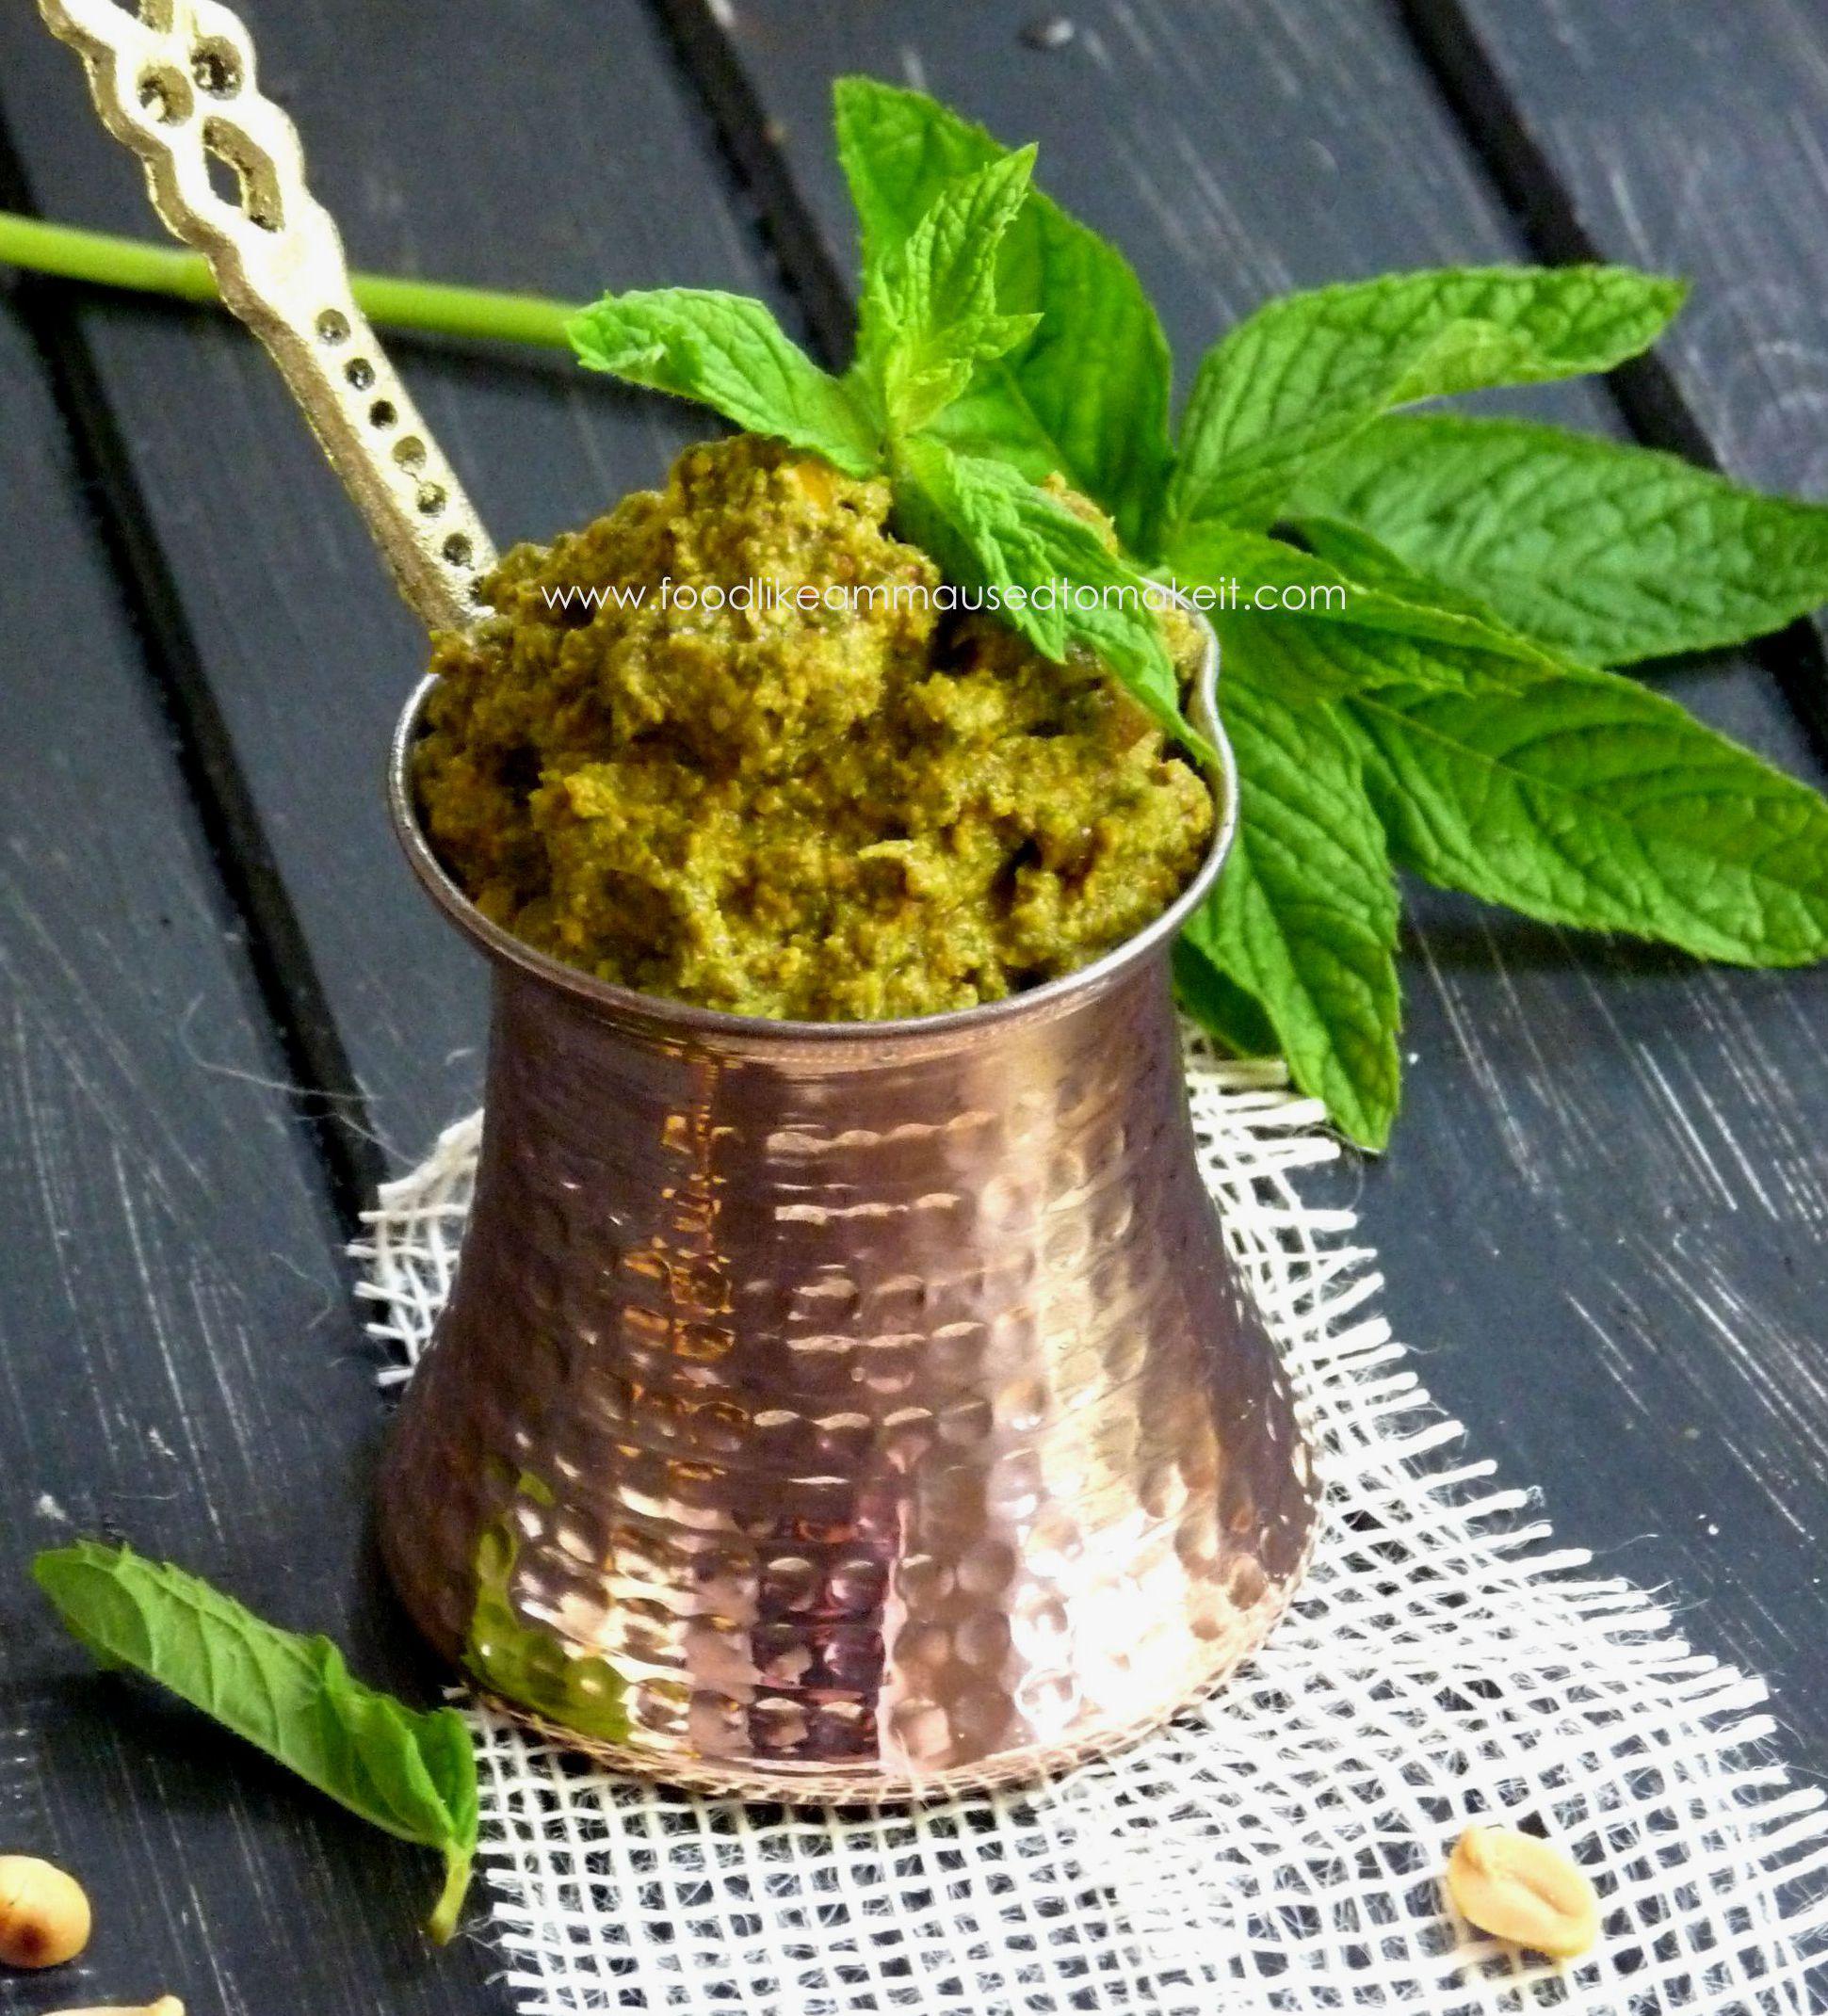 Mint Chutney Recipe (Pudina Chutney)